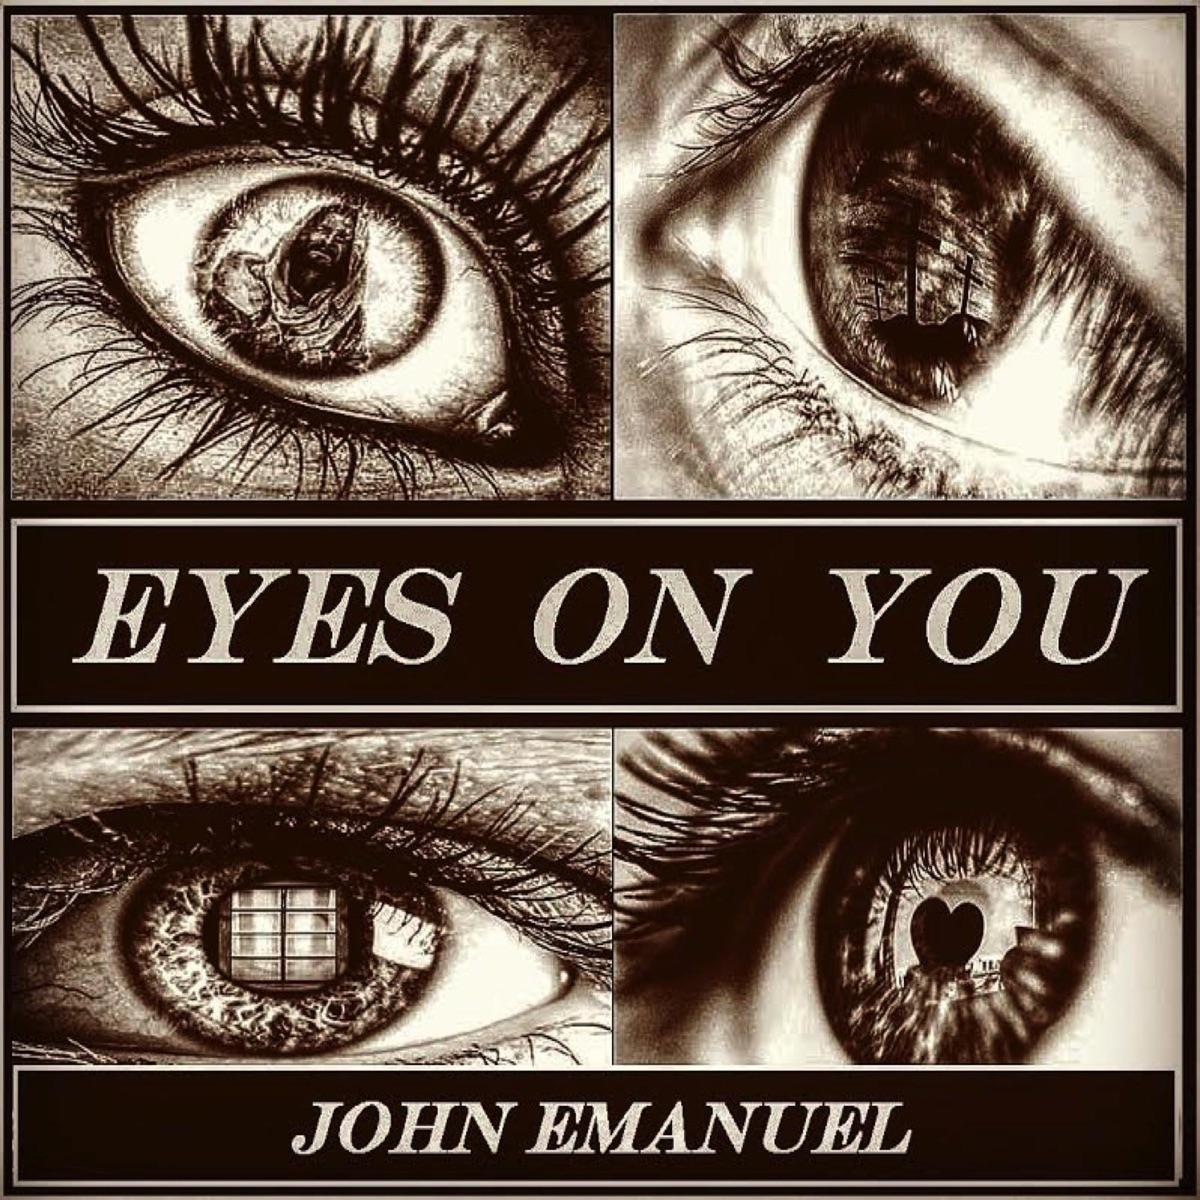 Eyes on You - EP John Emanuel CD cover